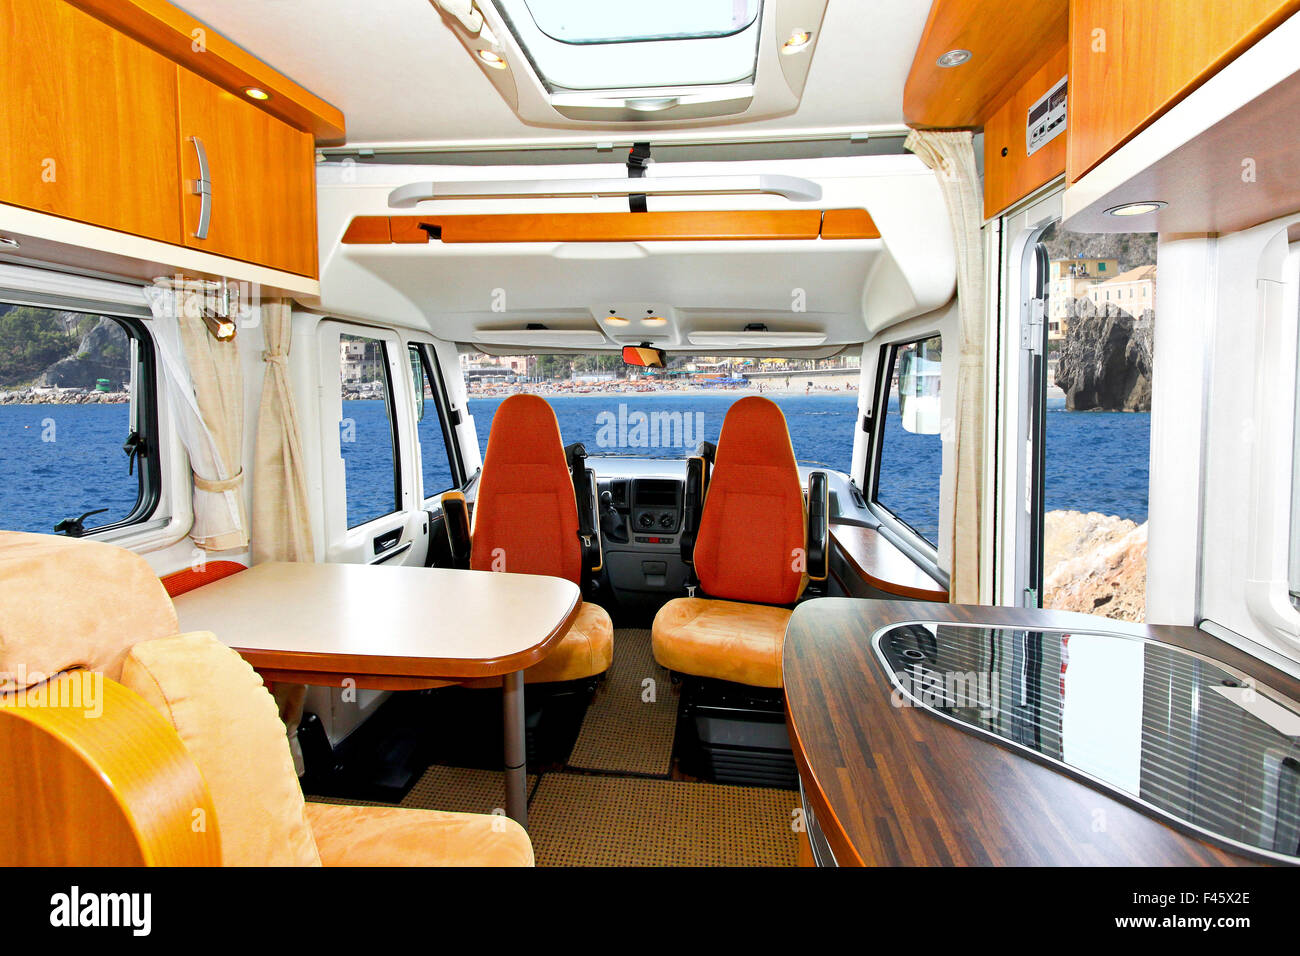 Bus And Trailer Stockfotos & Bus And Trailer Bilder - Seite 3 - Alamy